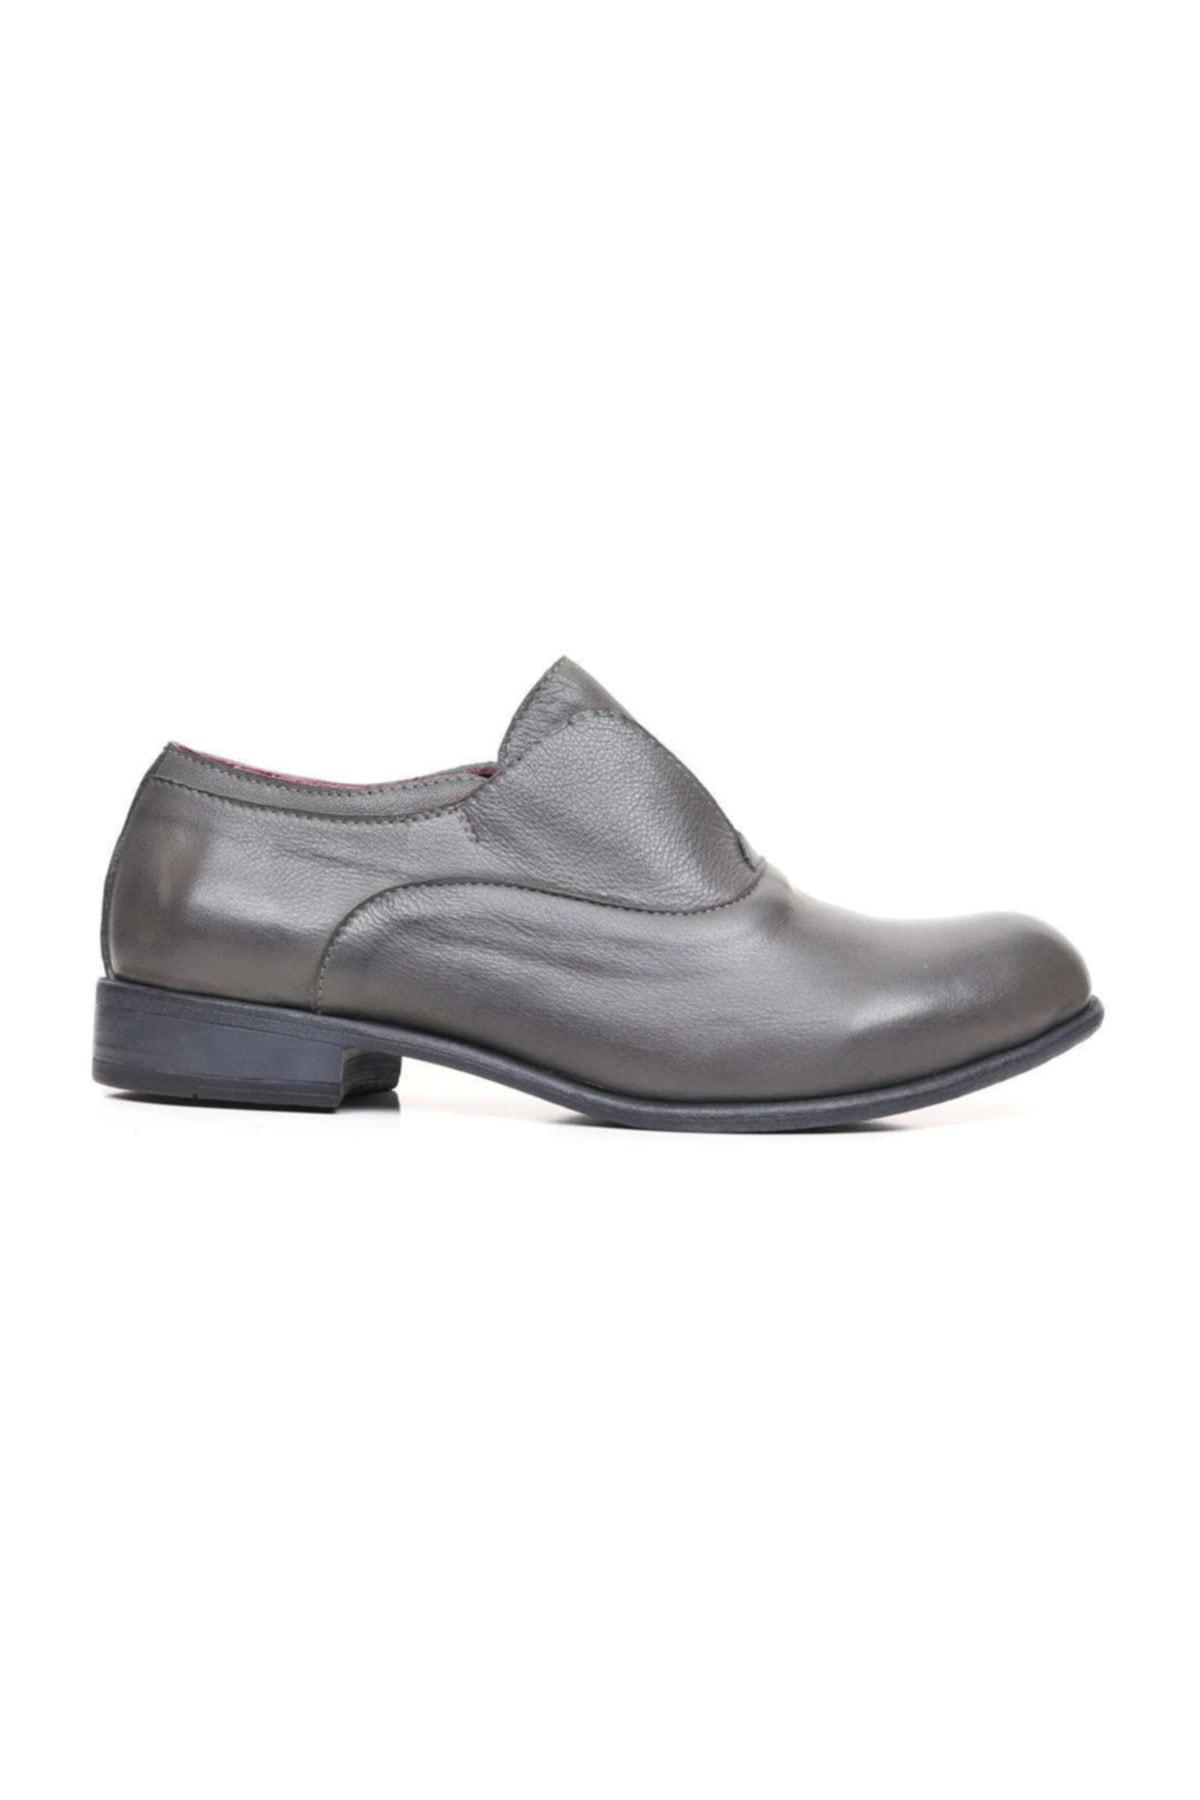 BUENO Shoes  Kadın Ayakkabı 9p1706 1